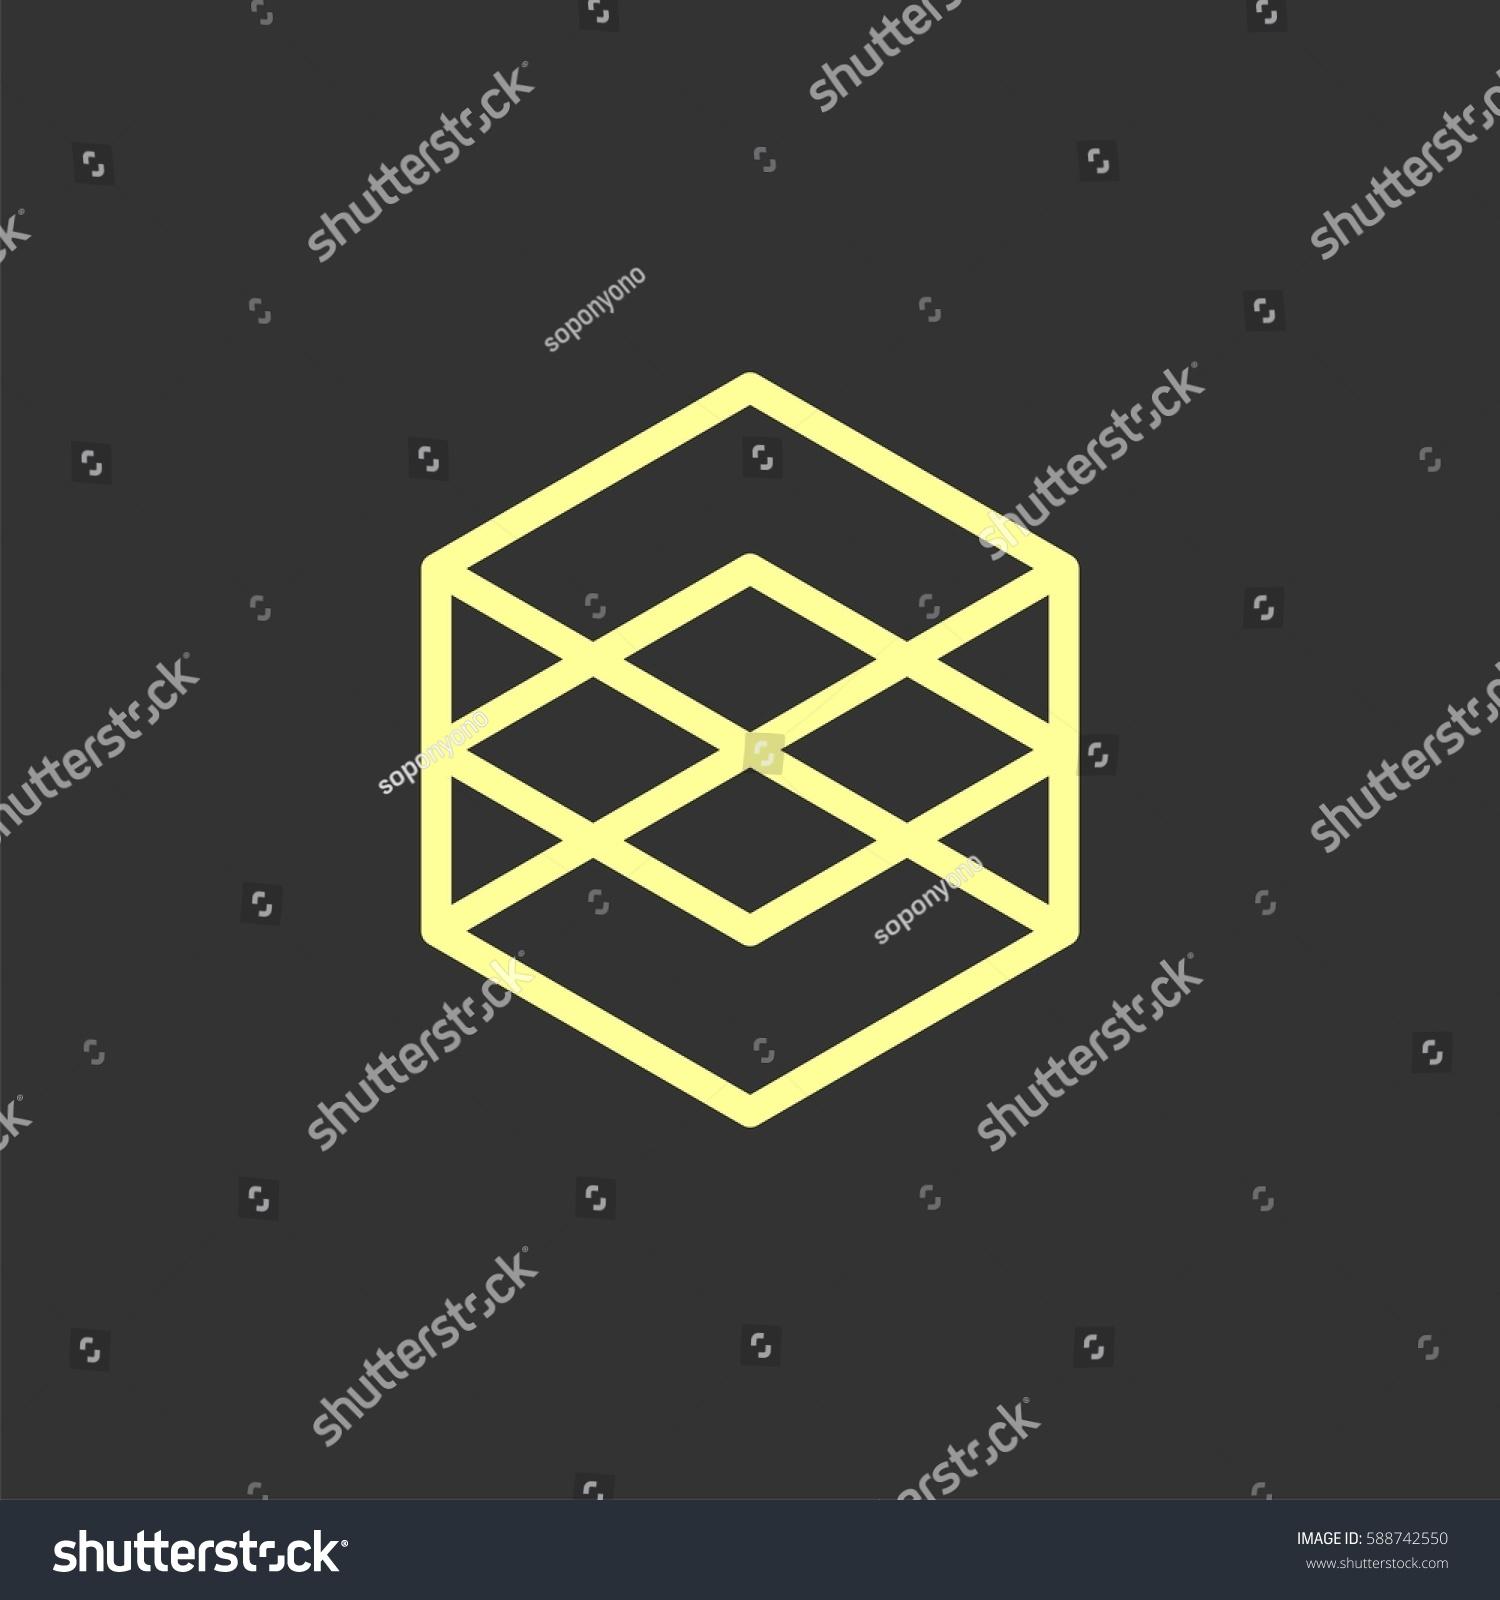 Single Hexagon Vector | www.imgkid.com - The Image Kid Has It!